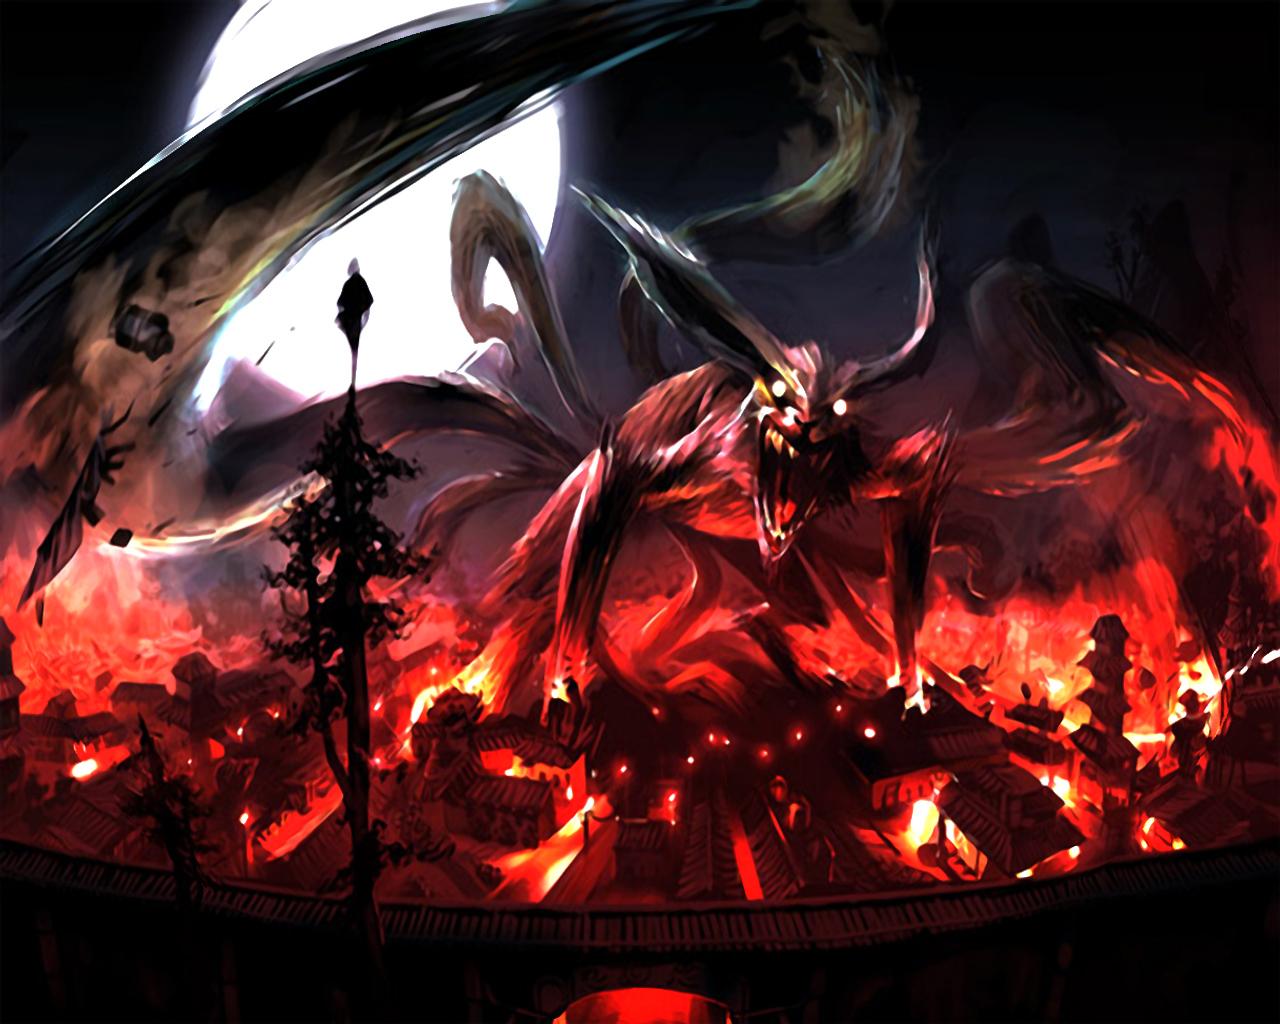 Nine Tails Naruto Anime Wallpaper Wallpaper WallpaperLepi 1280x1024